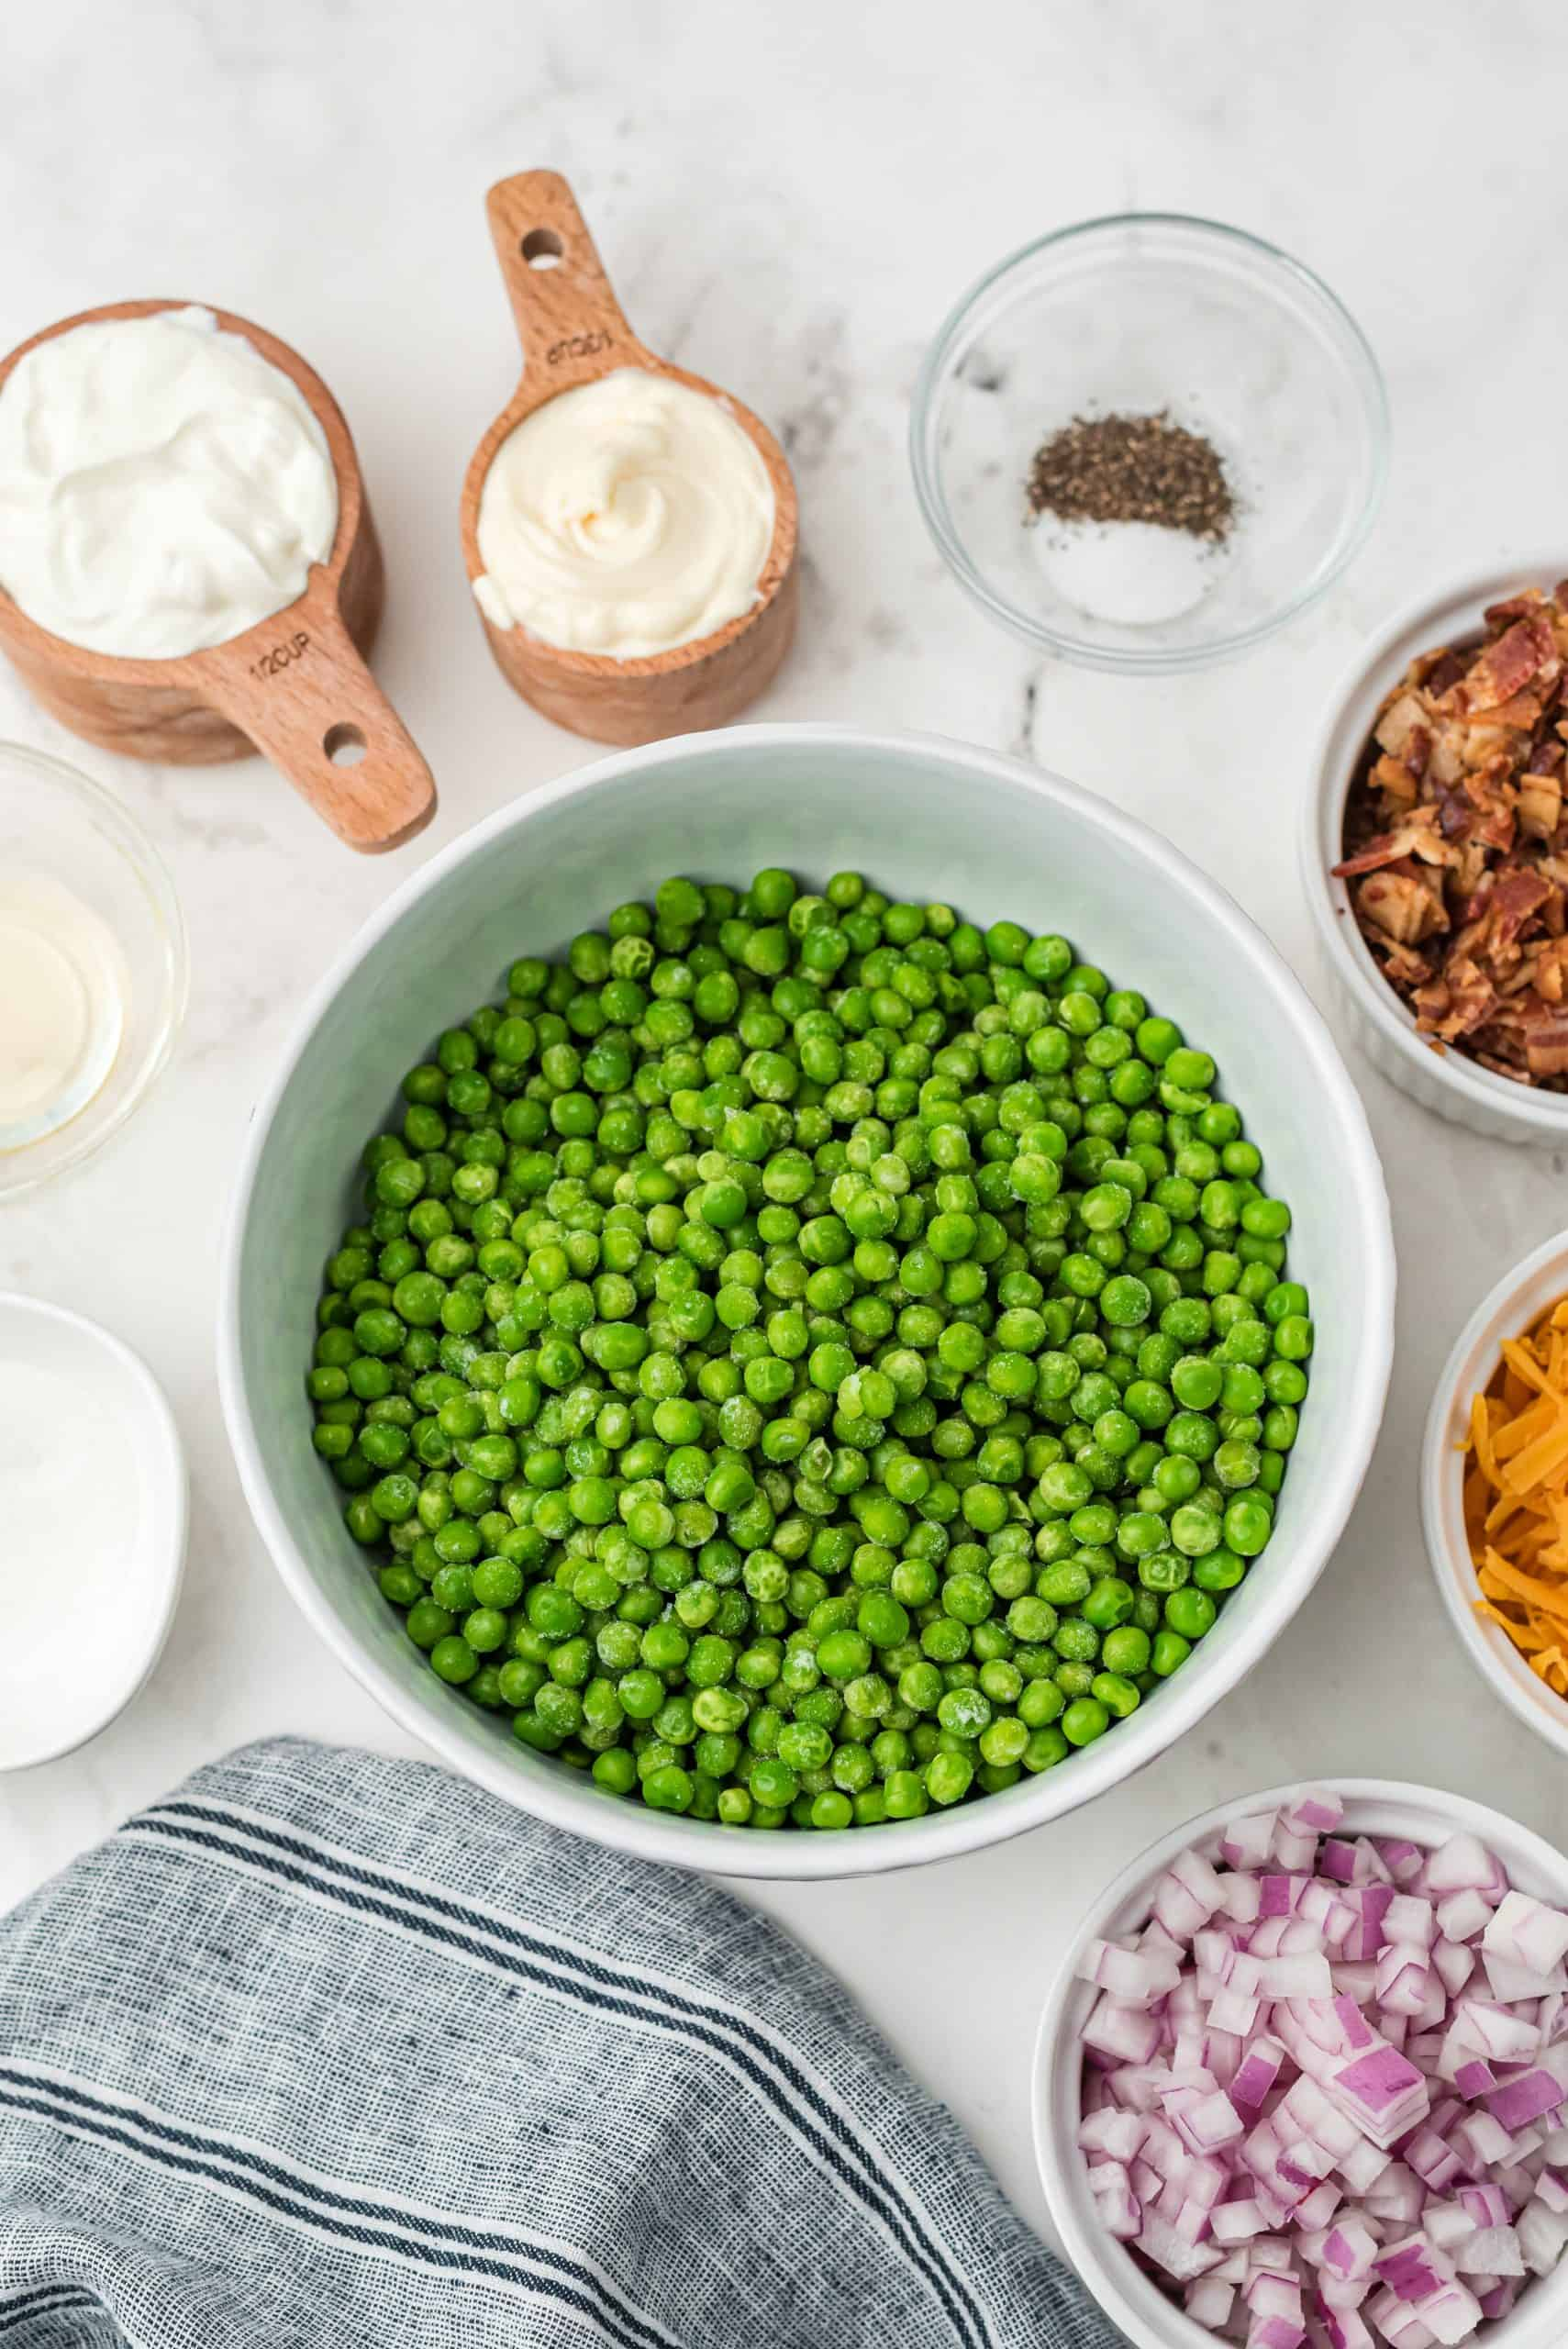 ingredients: frozen peas, red onion, sour cream, mayonnaise, sugar, apple cider vinegar, salt and pepper